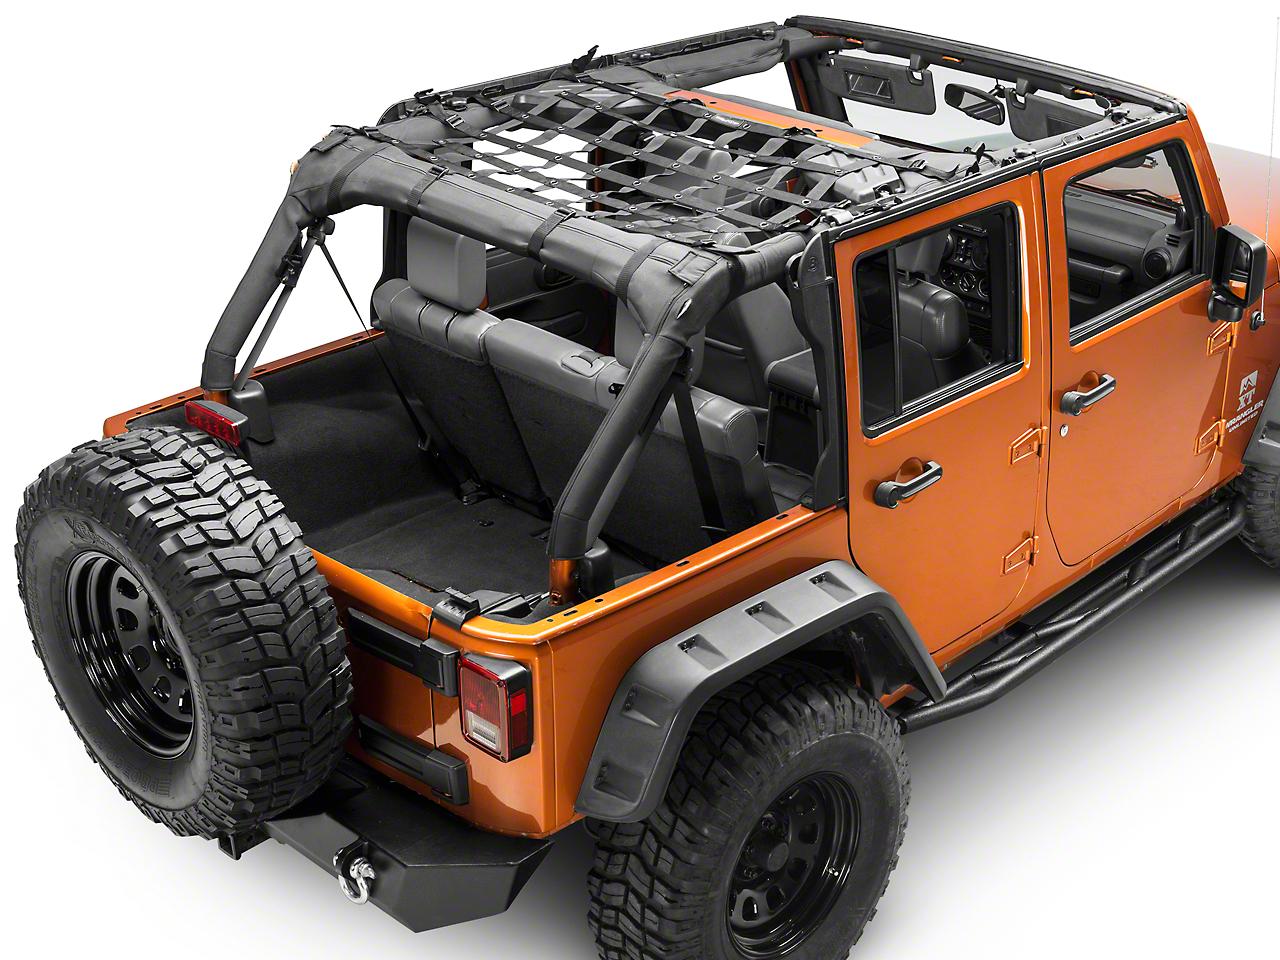 Dirty Dog 4x4 Rear Seat Netting - Black (07-11 Jeep Wrangler JK 4 Door)